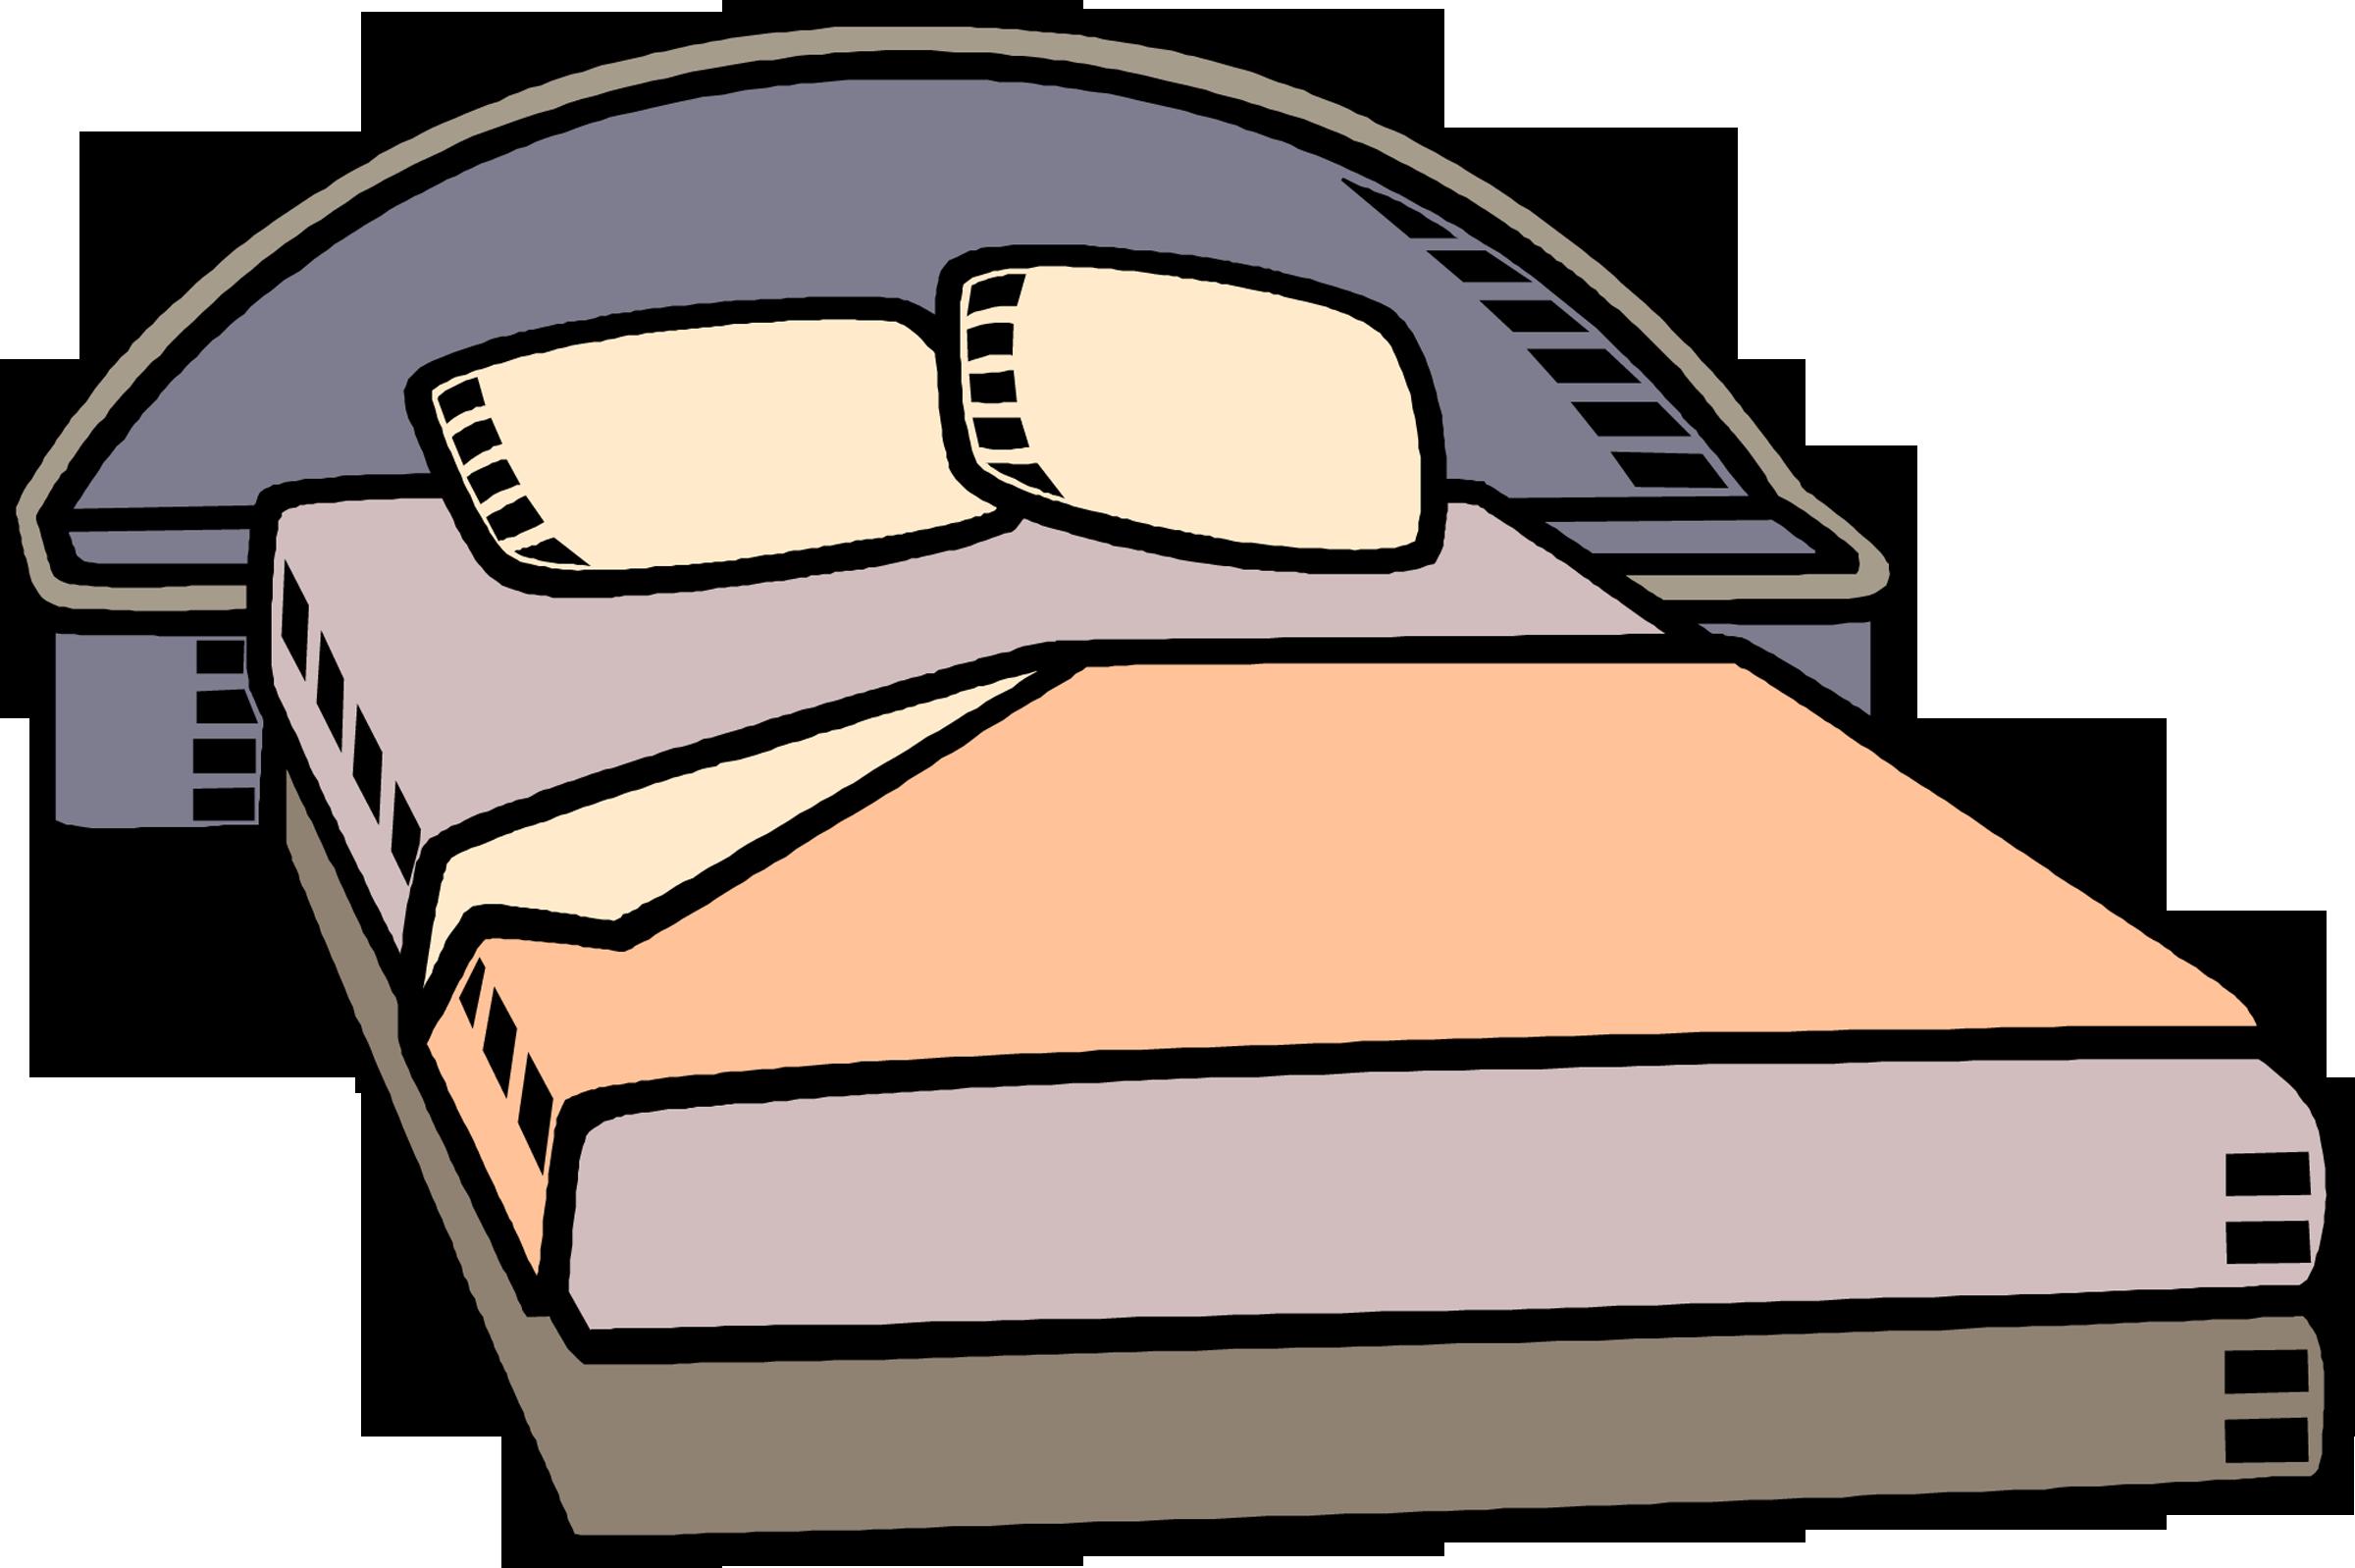 2400x1598 Bed Clip Art Clipart Free Microsoft 3 2